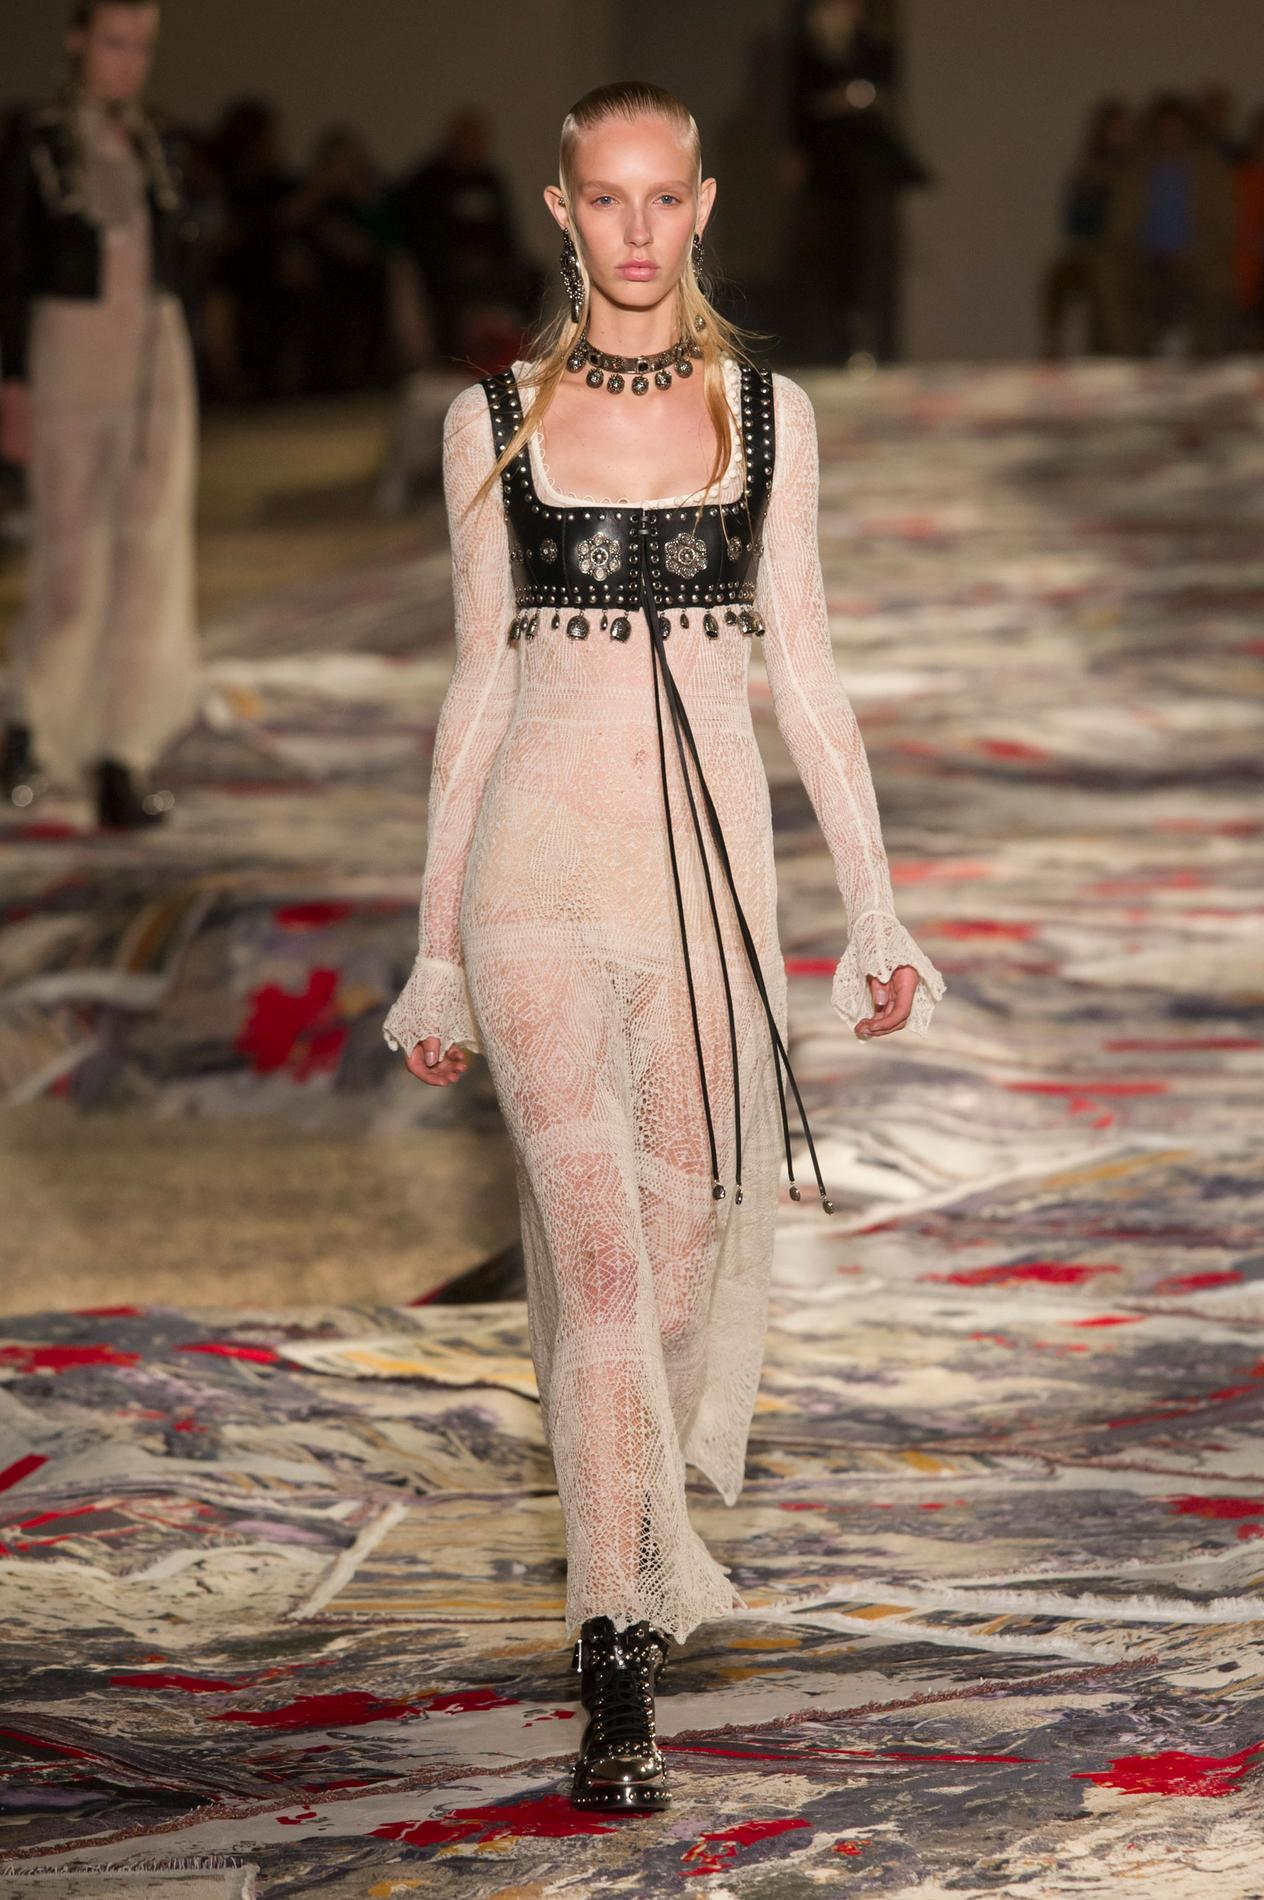 6891bdf60ba8 Alexander McQueen, Emporio Armani, Hermès... À Paris, la mode est ...